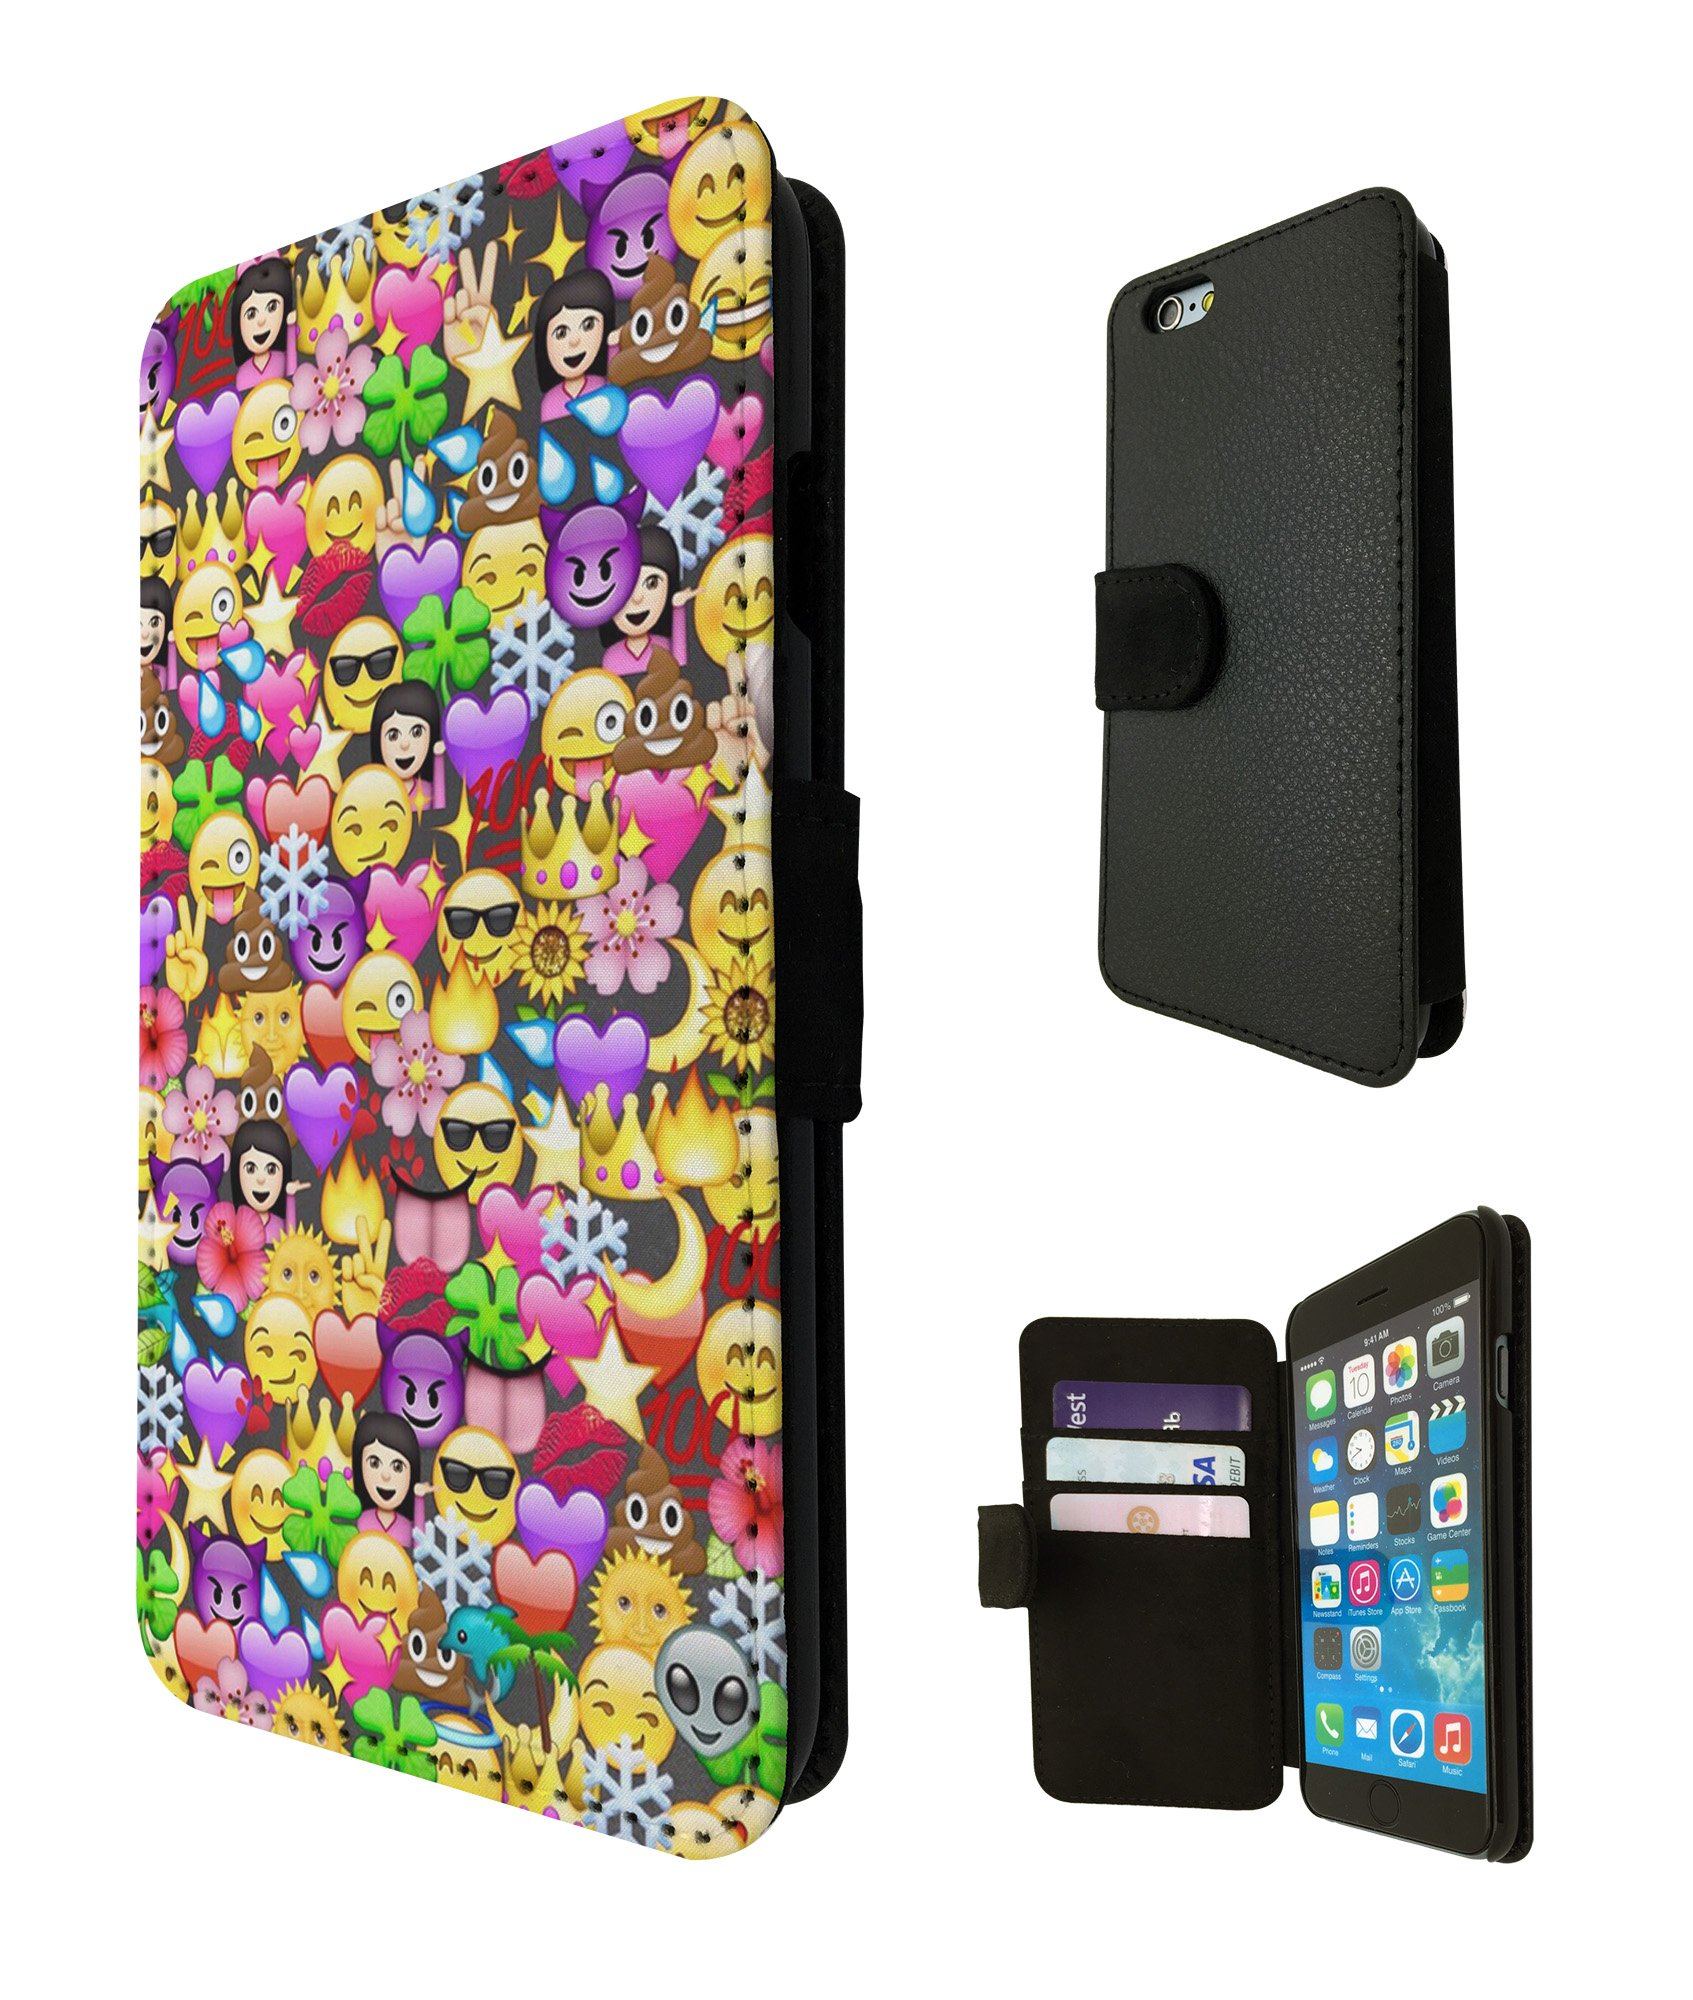 Amazon Com 2070 Cool Fun Funny Emoji Wallpaper Crown Princess Poop Devil Smiley Love Heart Design Iphone 6 Plus Iphone 6 S Plus 5 5 Flip Case Case Flip Credit Card Purse